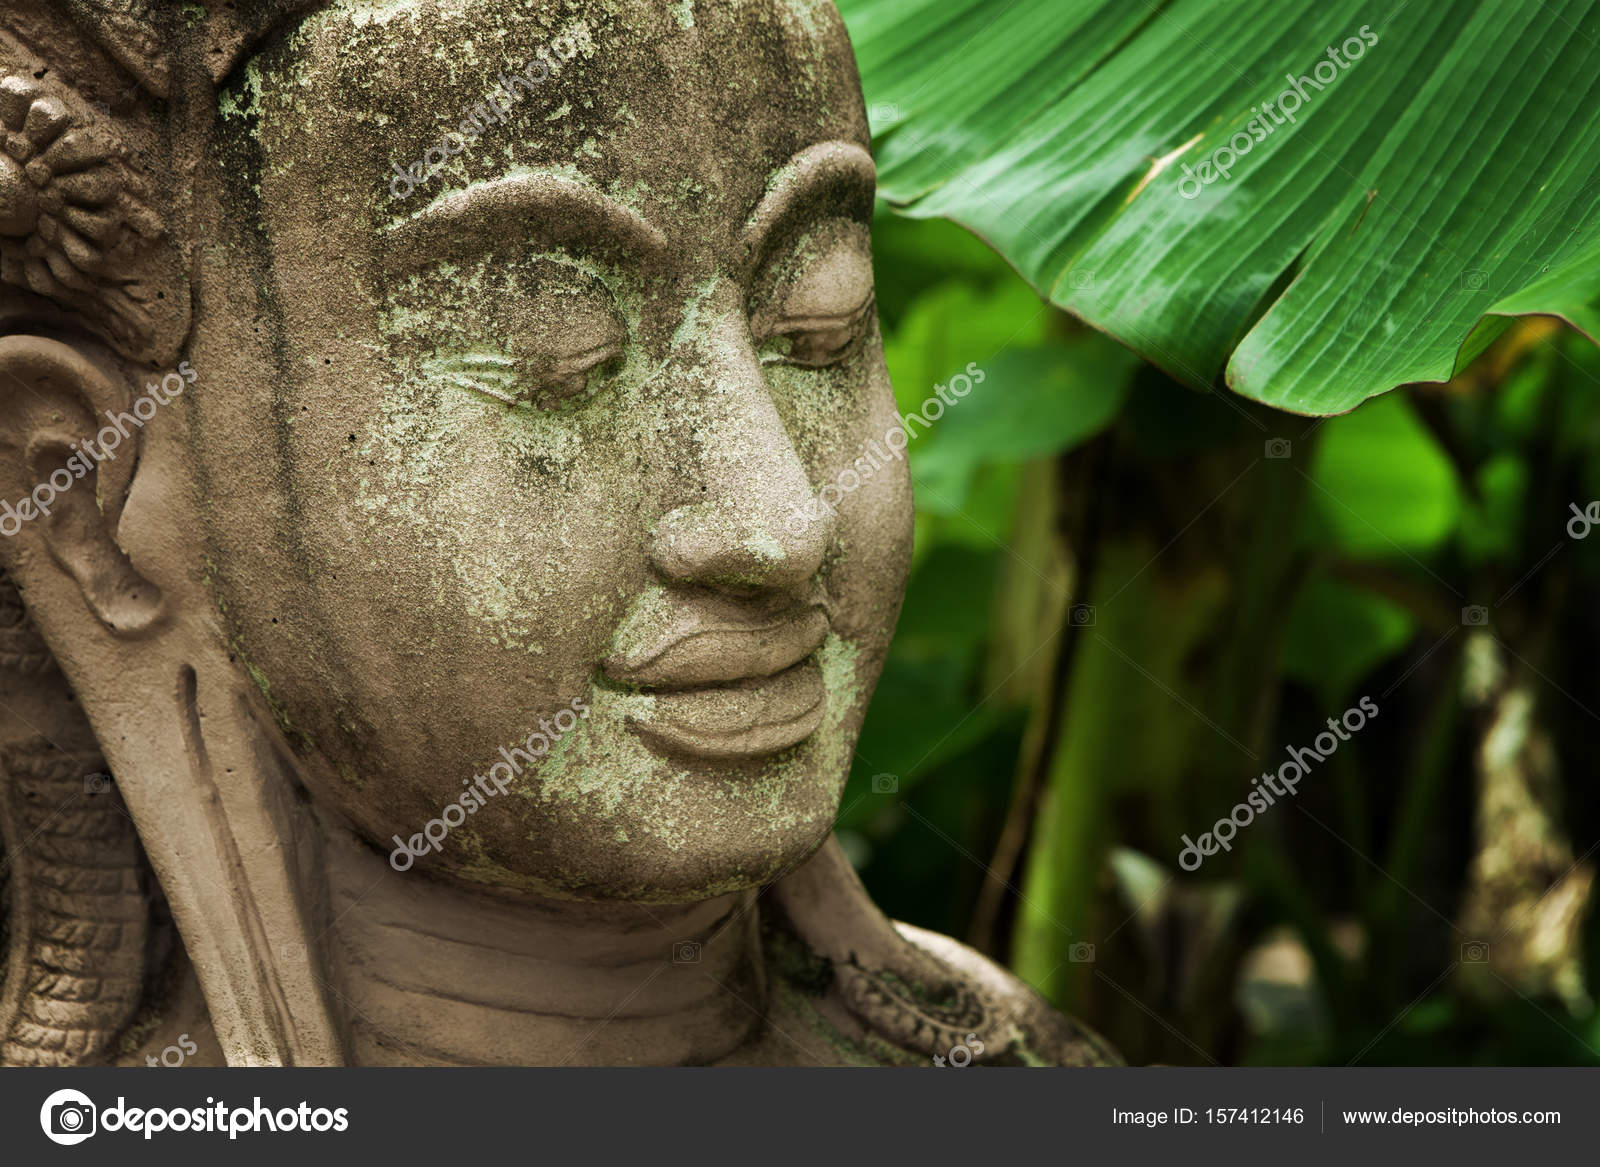 Boeddha Beeld Beton.Close Up Van Oude Betonnen Boeddhabeeld Op Groene Rug Stockfoto